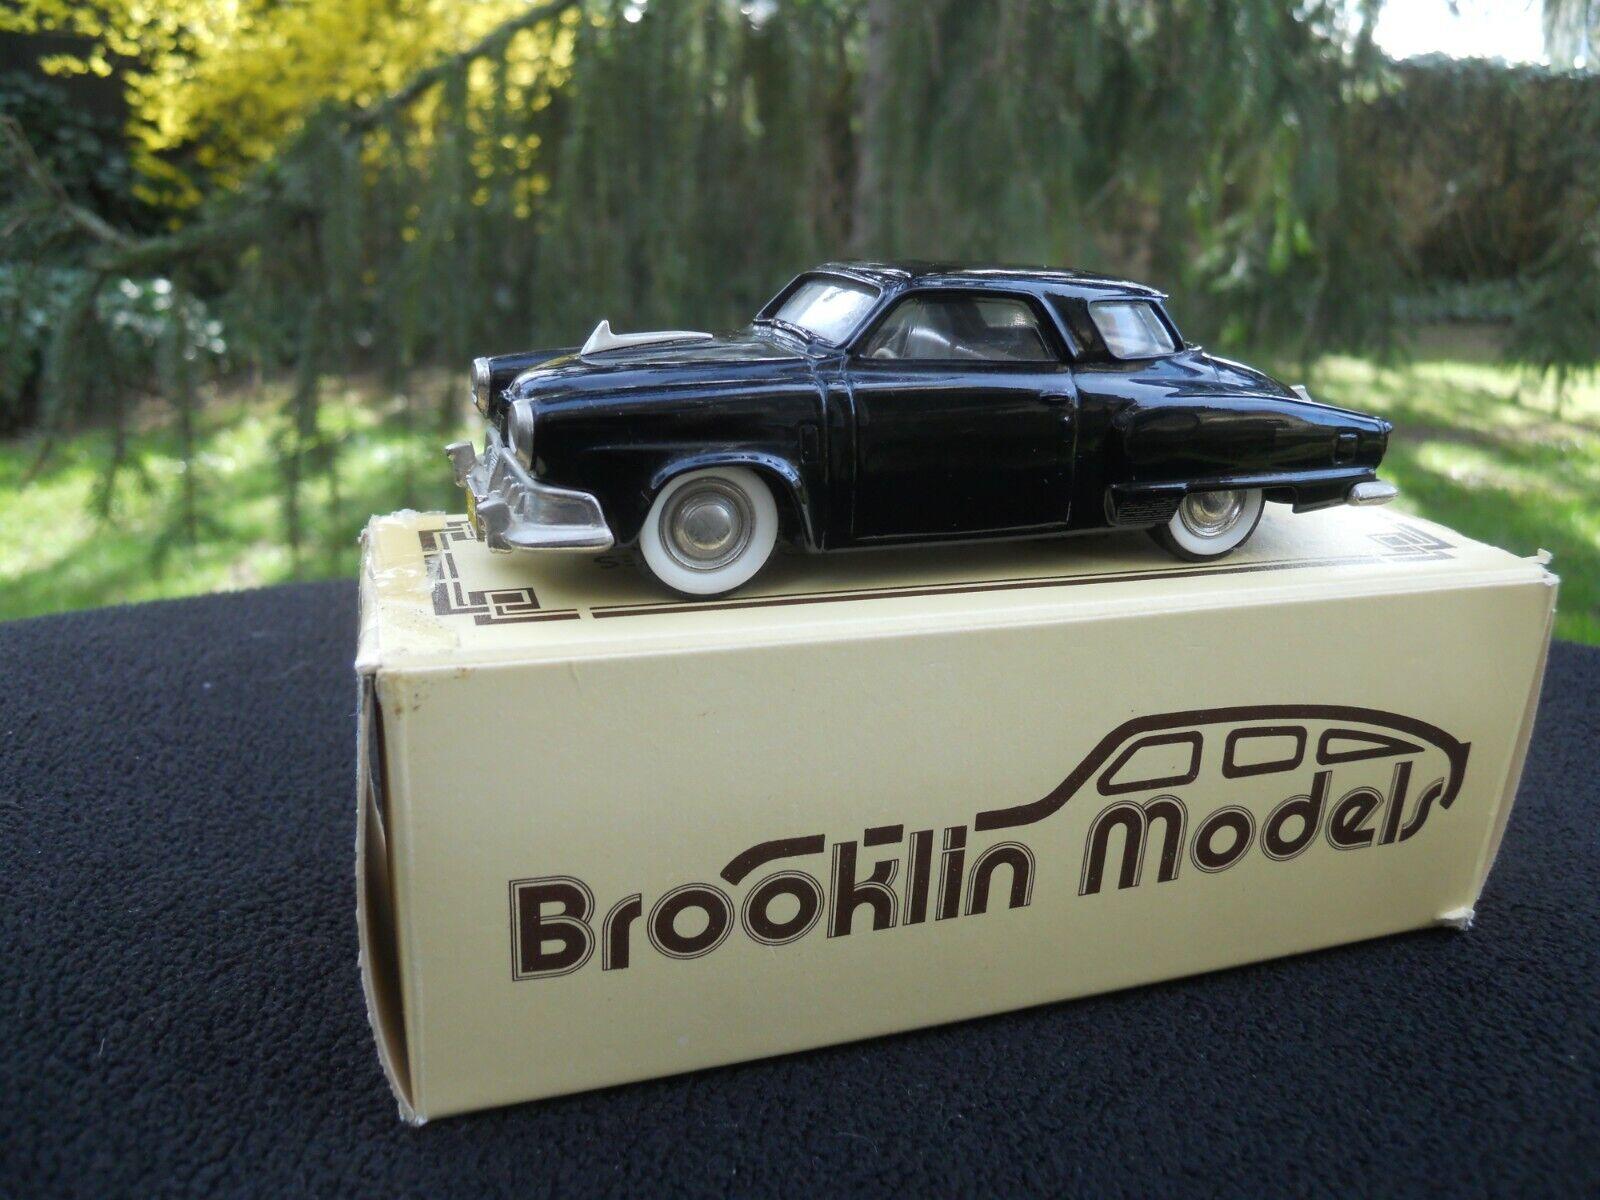 BROOKLIN MODELS MODELS MODELS 17 STUDEBAKER CHAMPION STARLIGHT COUPE 1952 00591f